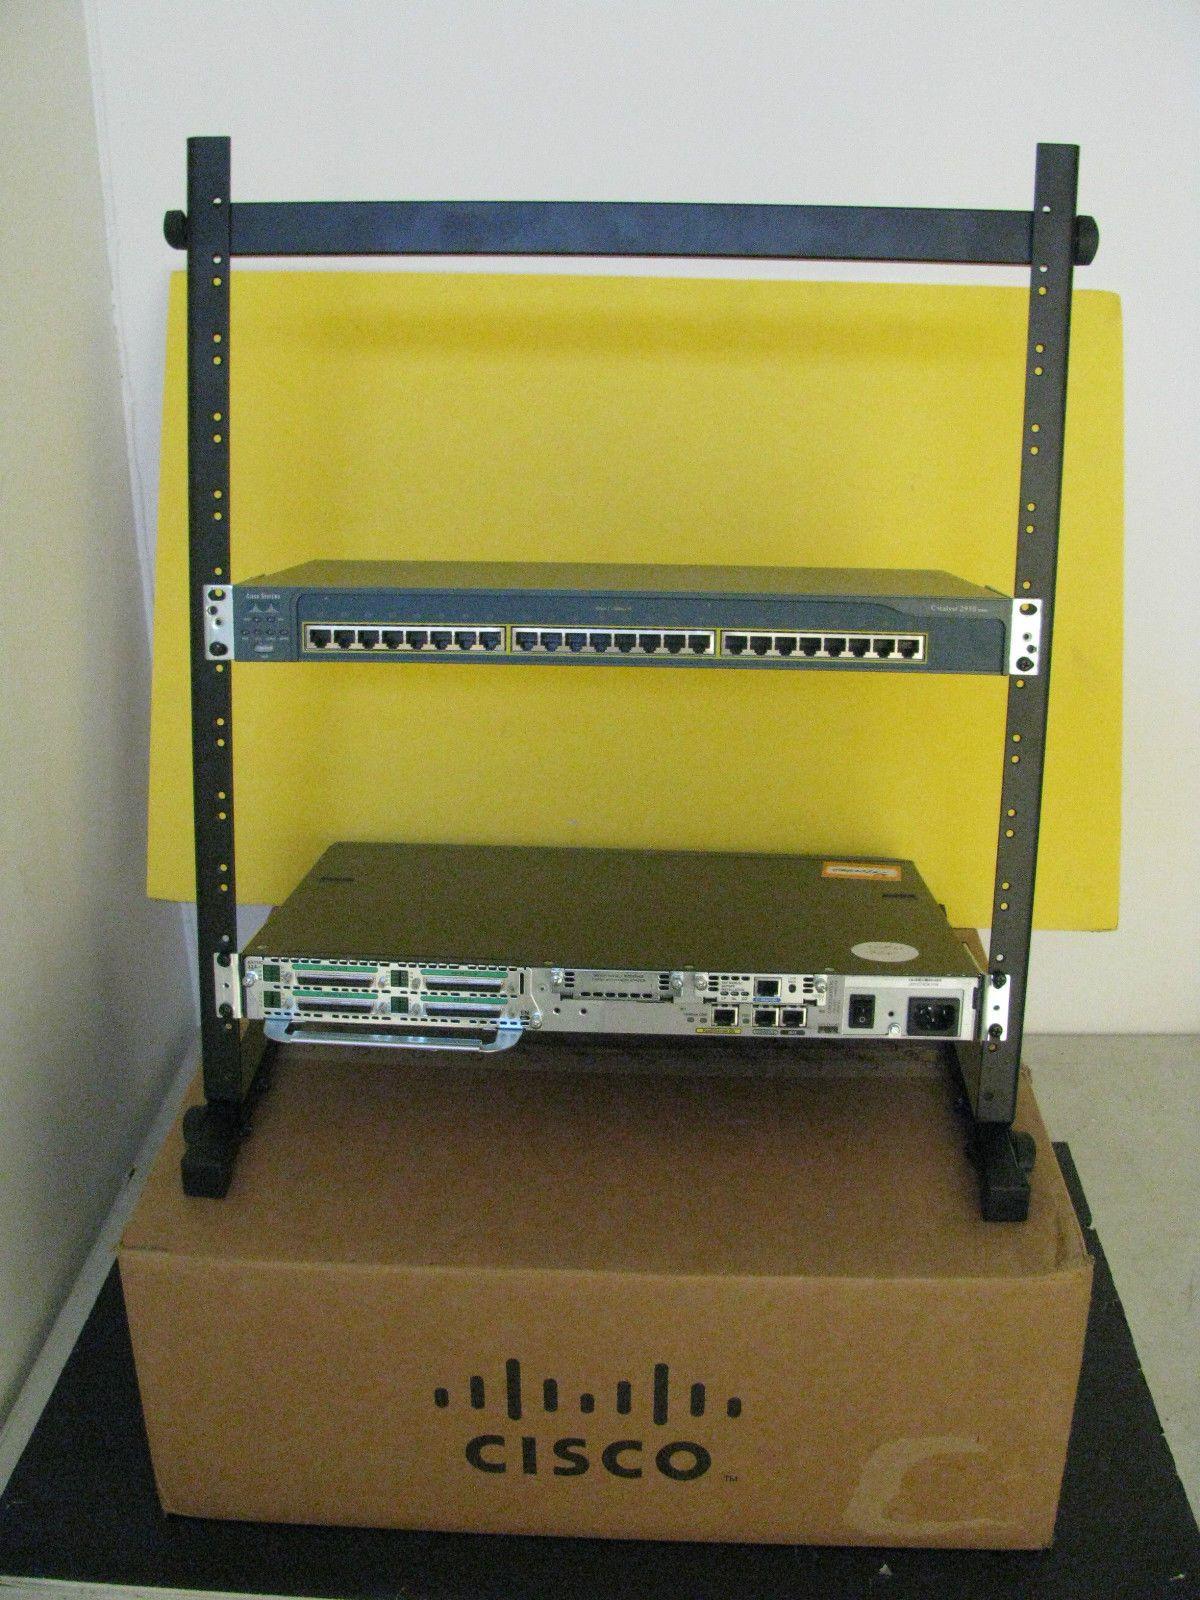 medium resolution of cisco 12u 19 rack ccna ccnp ccie network lab 3524 3550 2500 2600 2800 3560 3750 ebay this is a top pick